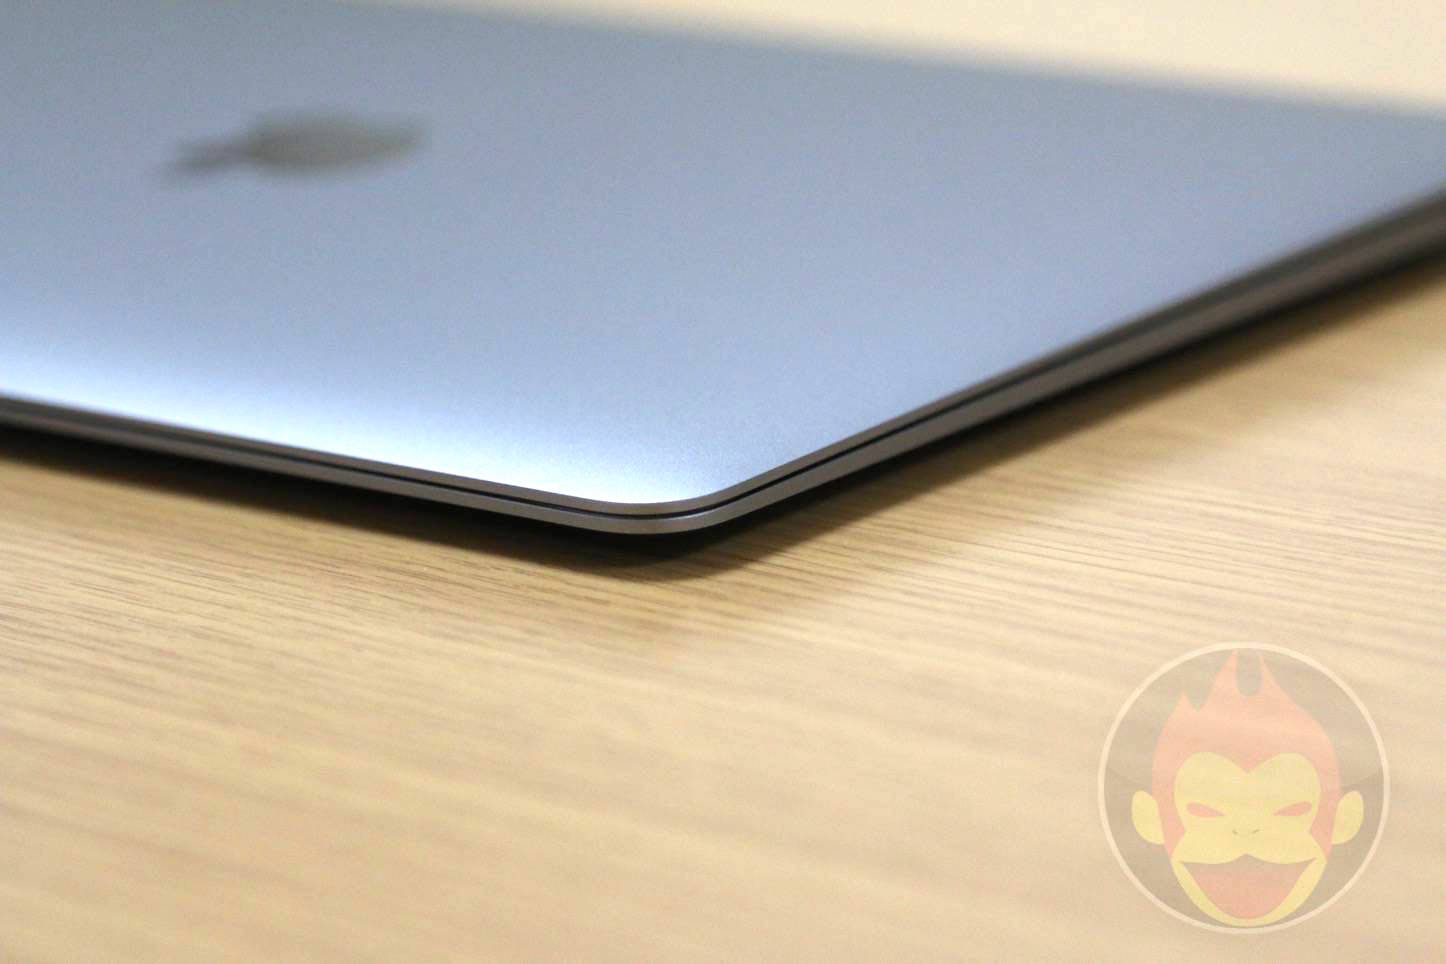 12inch-The-New-MacBook-52.JPG